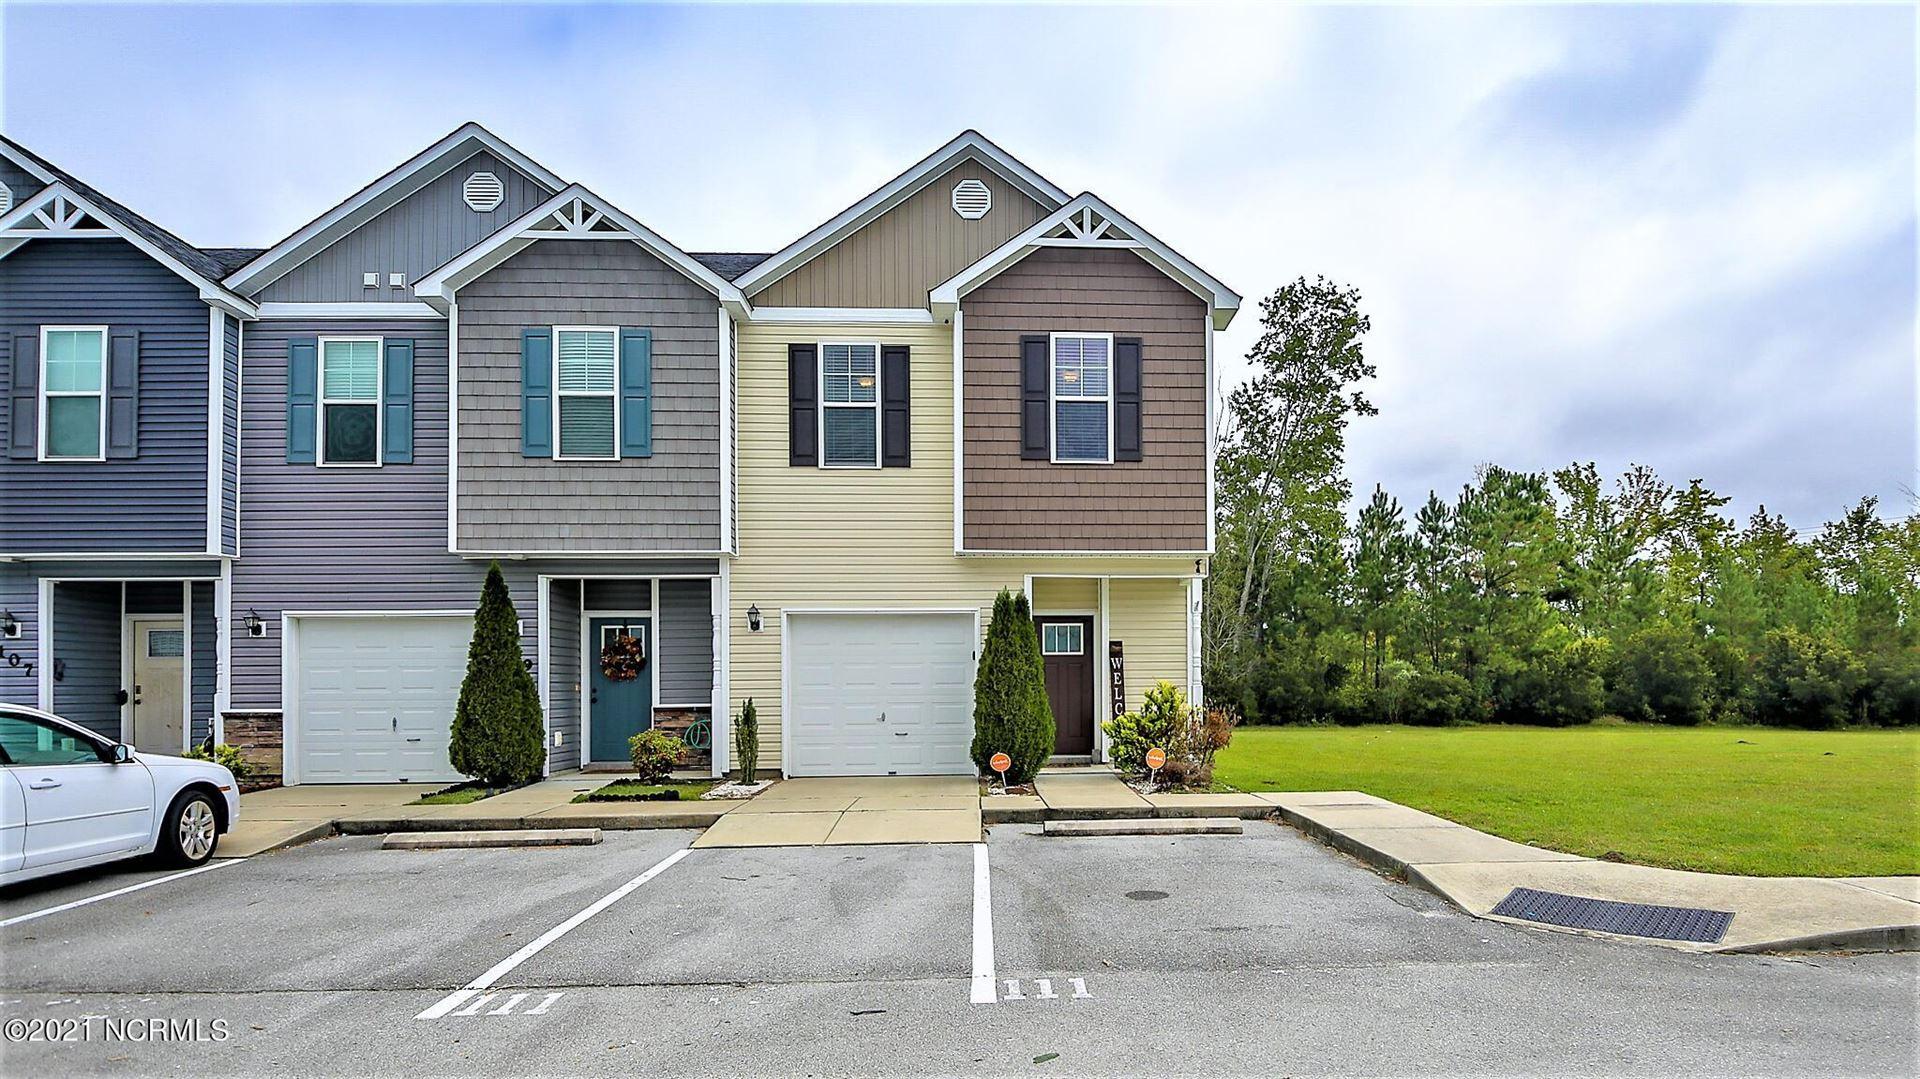 Photo of 111 Waterstone Lane, Jacksonville, NC 28546 (MLS # 100294760)